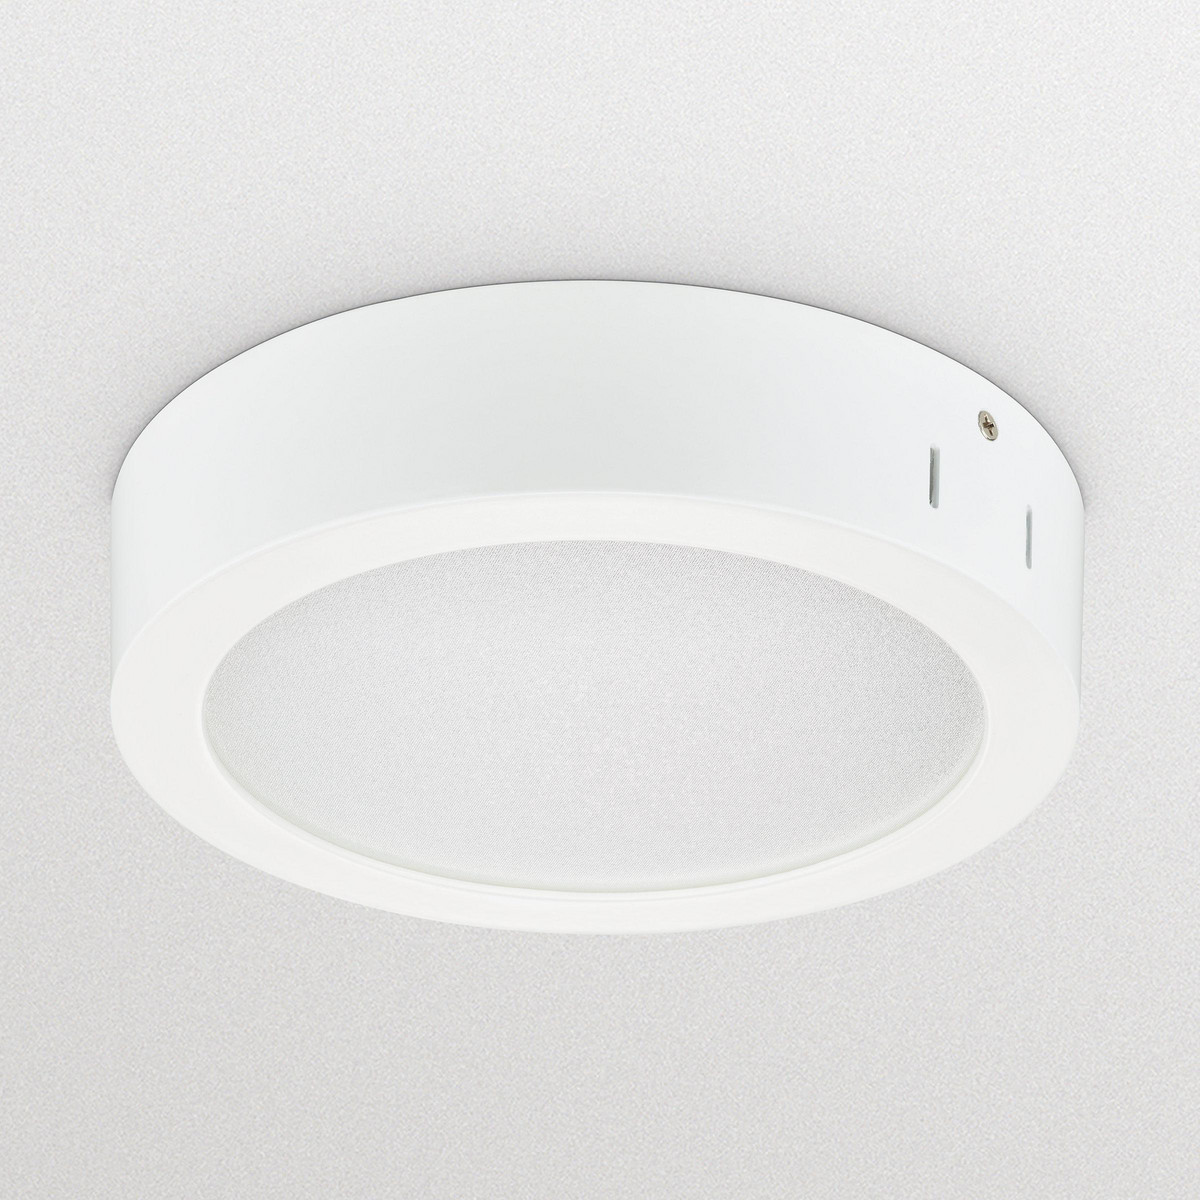 CoreLine SlimDownlight Gen3 Påbyg DN145C LED 2100lm/830 Hvid